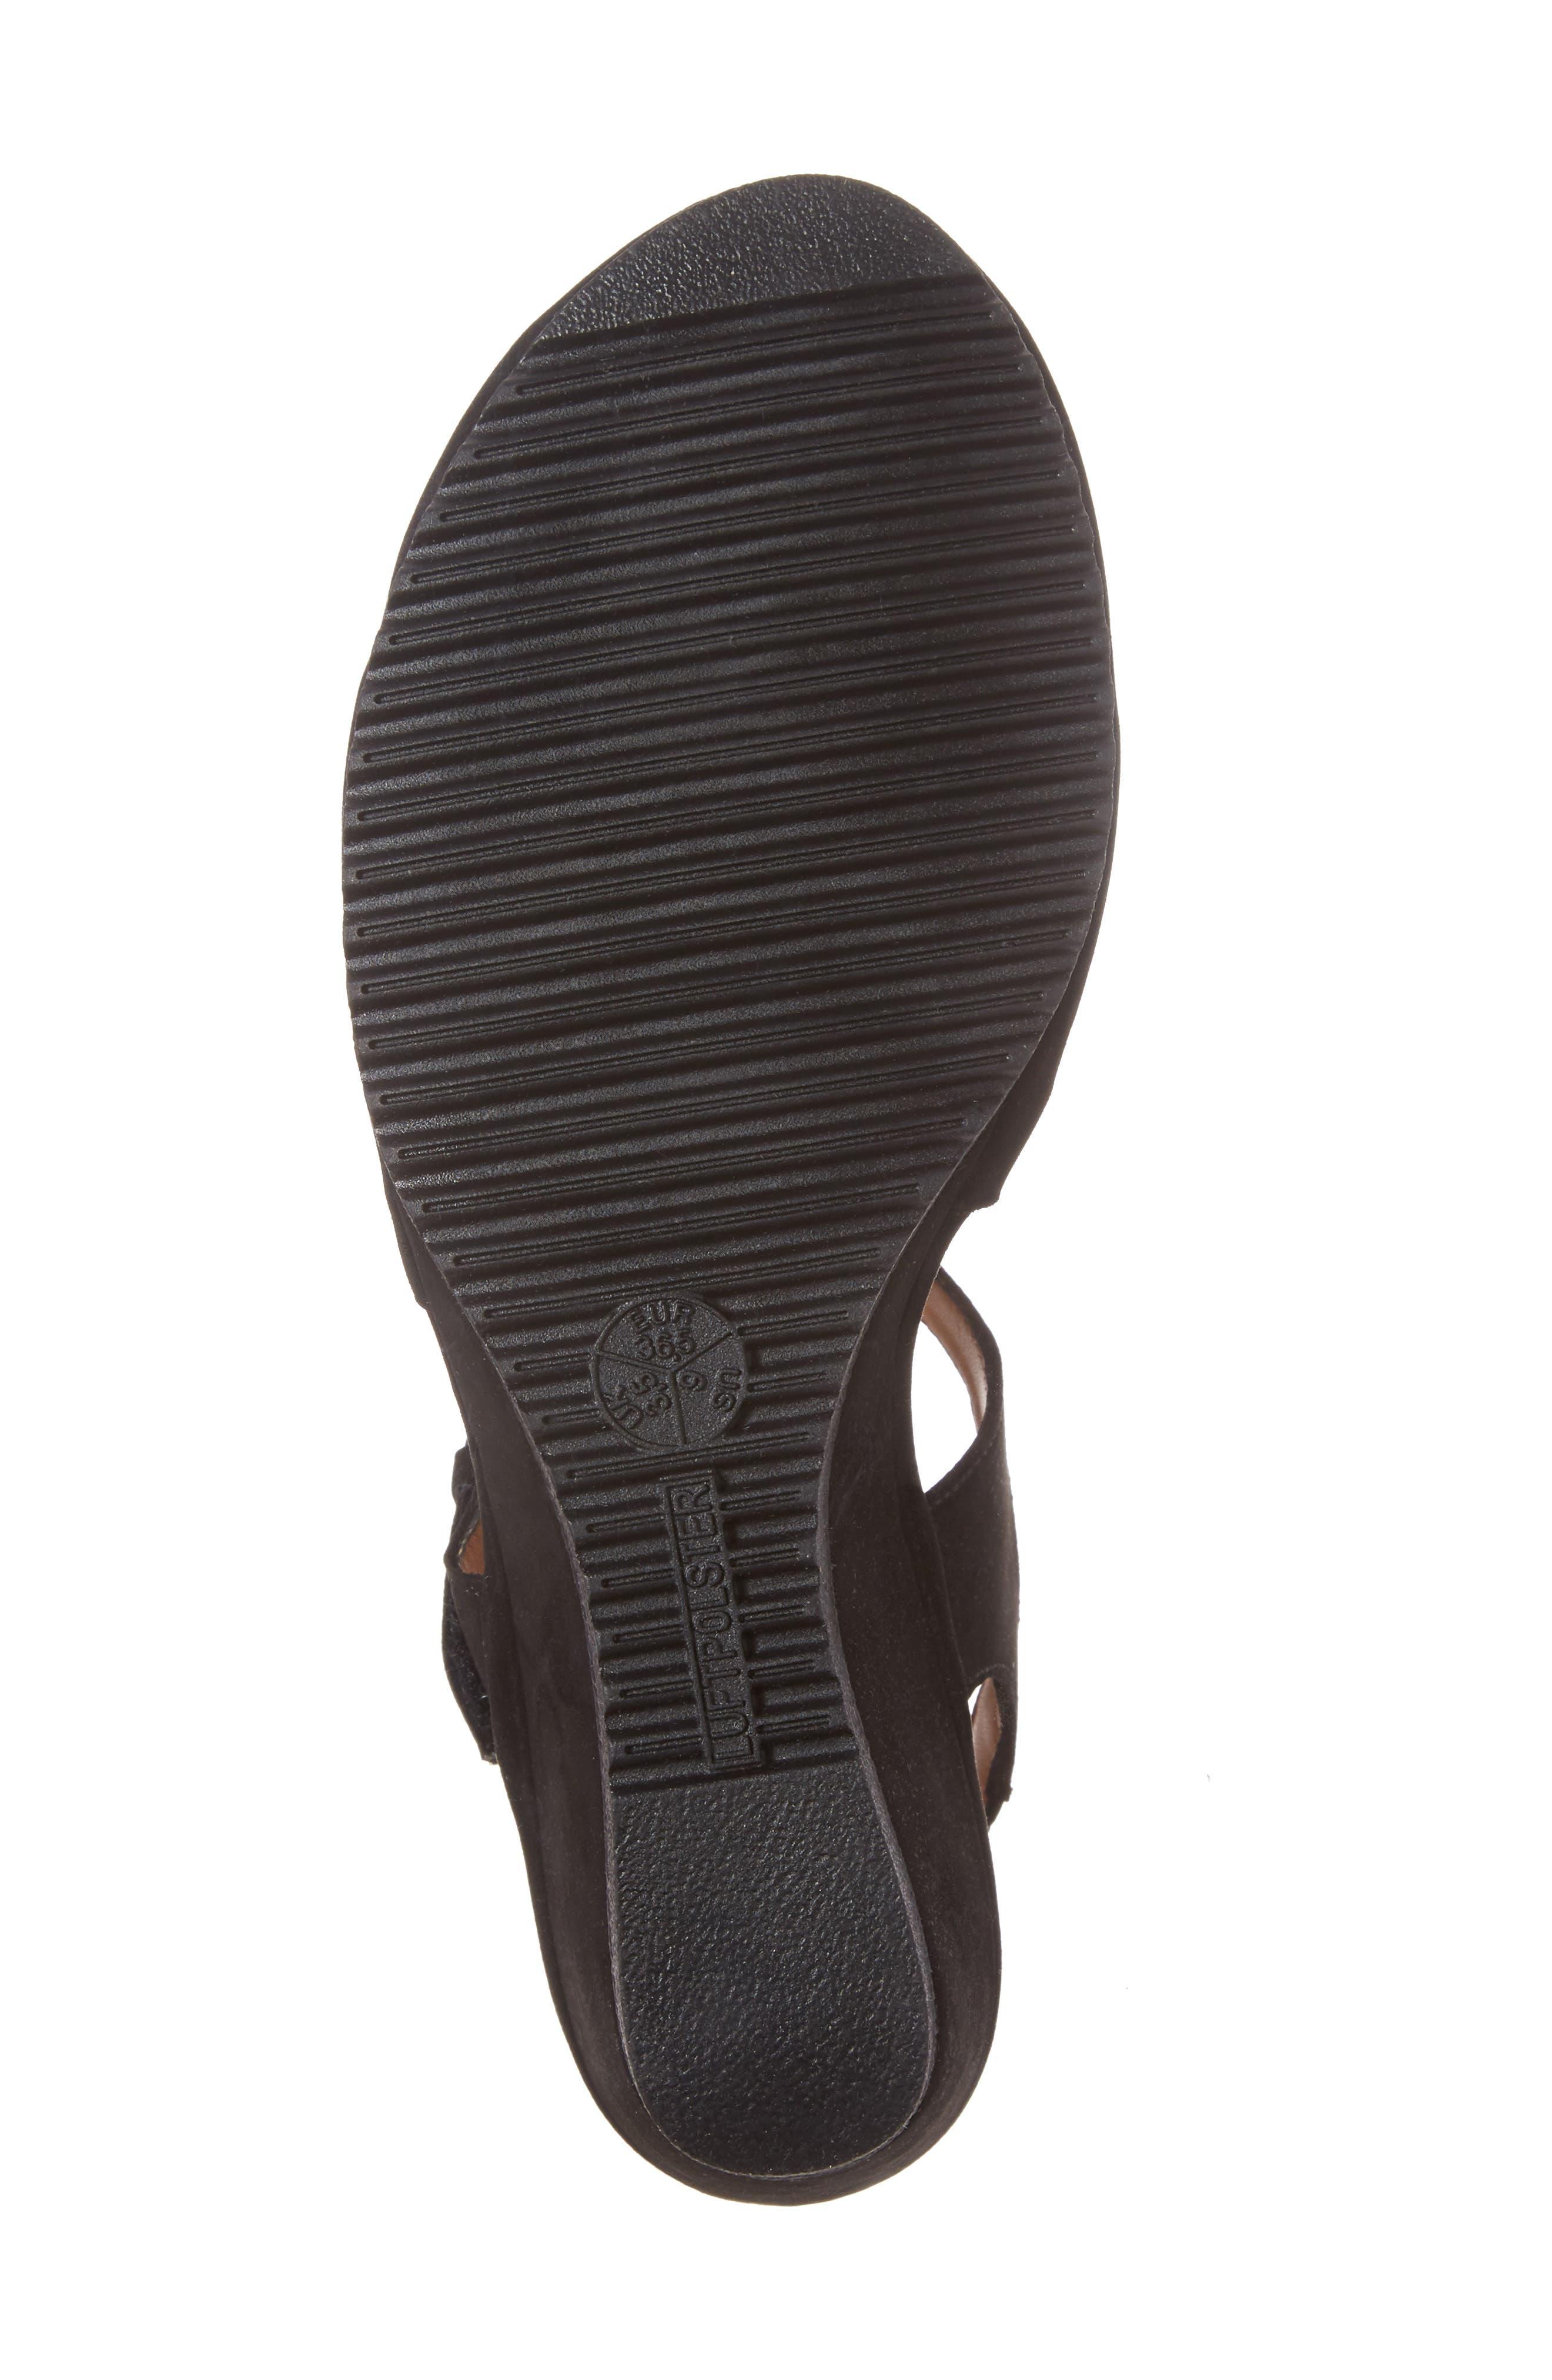 Wedge Sandal,                             Alternate thumbnail 6, color,                             Black